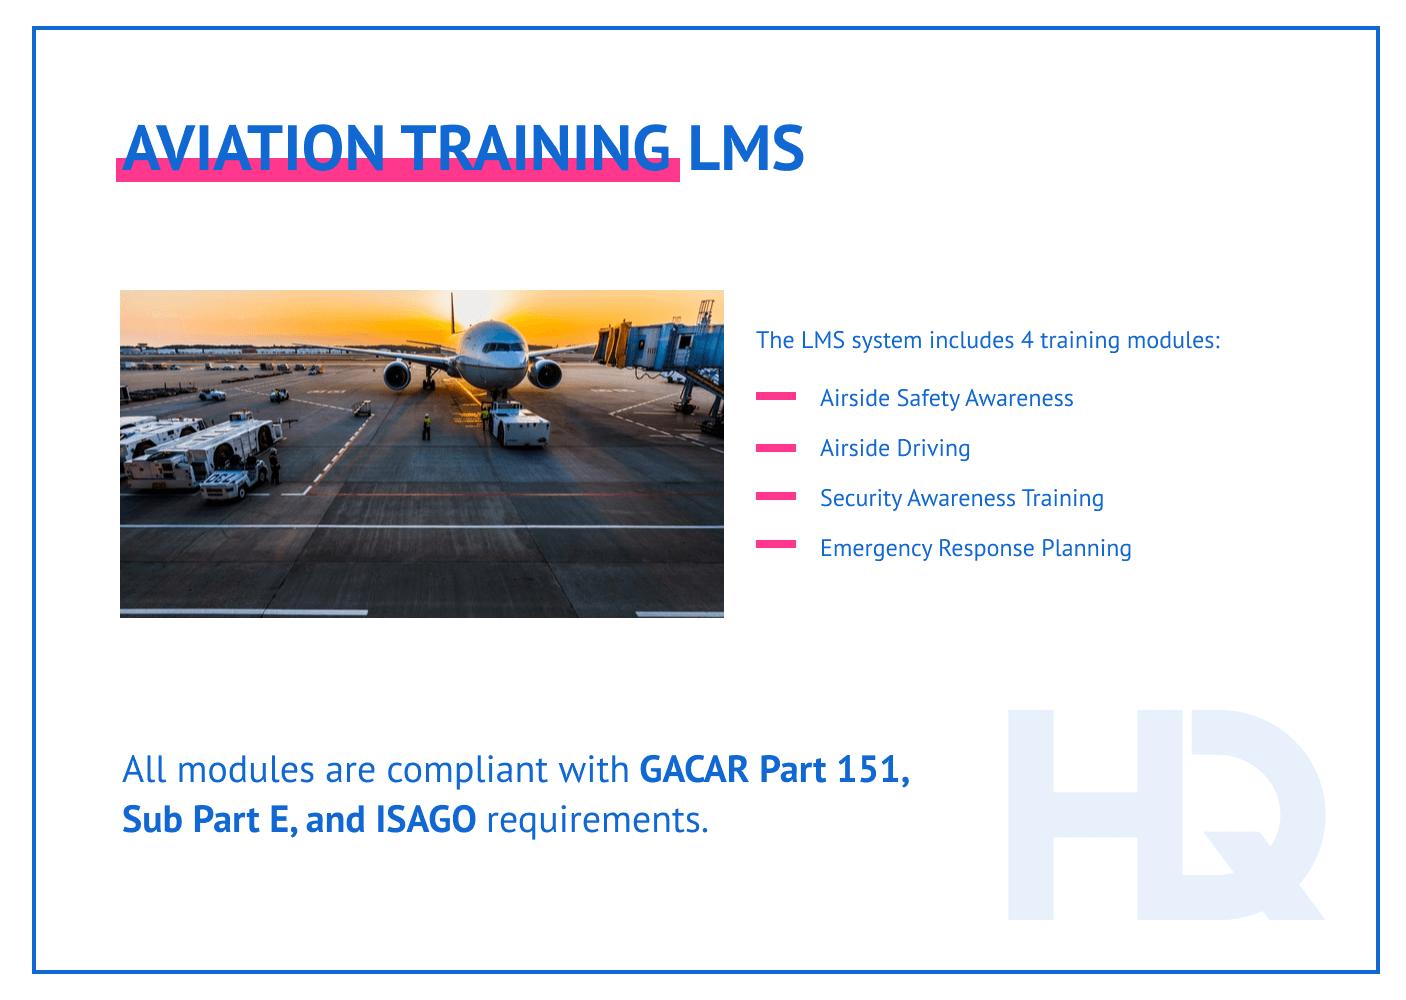 Case study: aviation training LMS